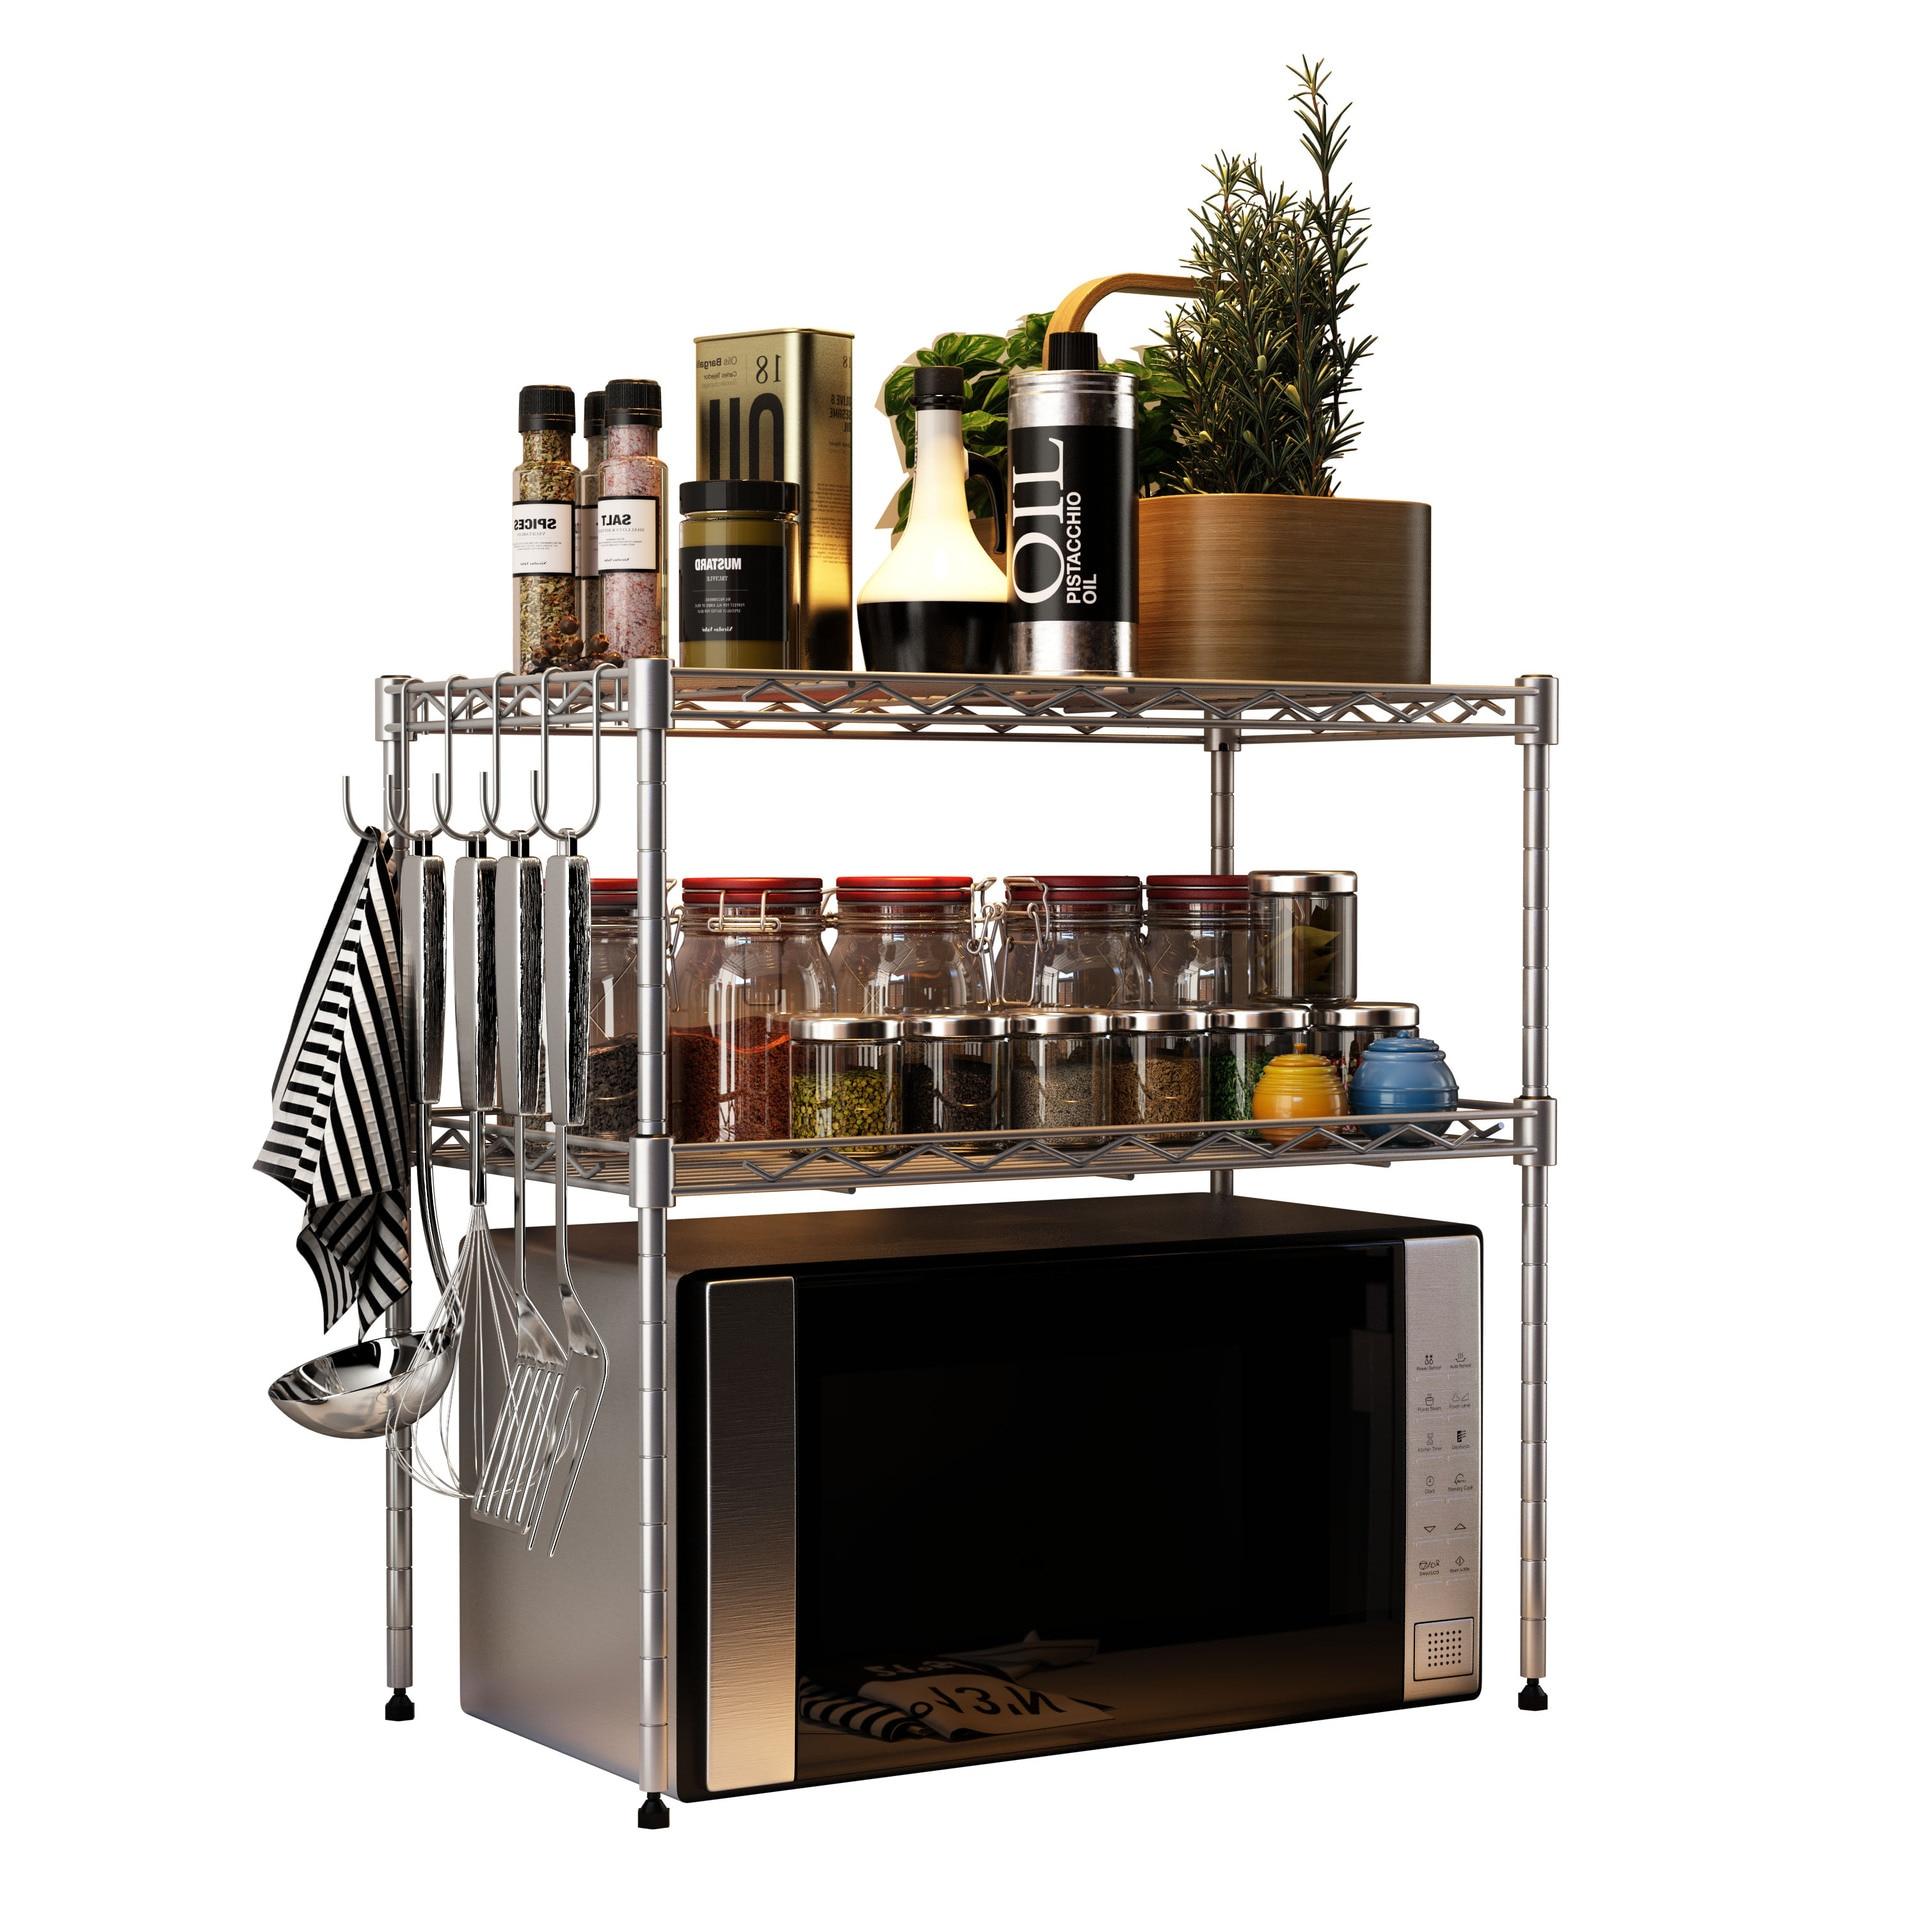 3 Tier Shlef Rack Office Shelving Kitchen Microwave Oven Storage Organizer